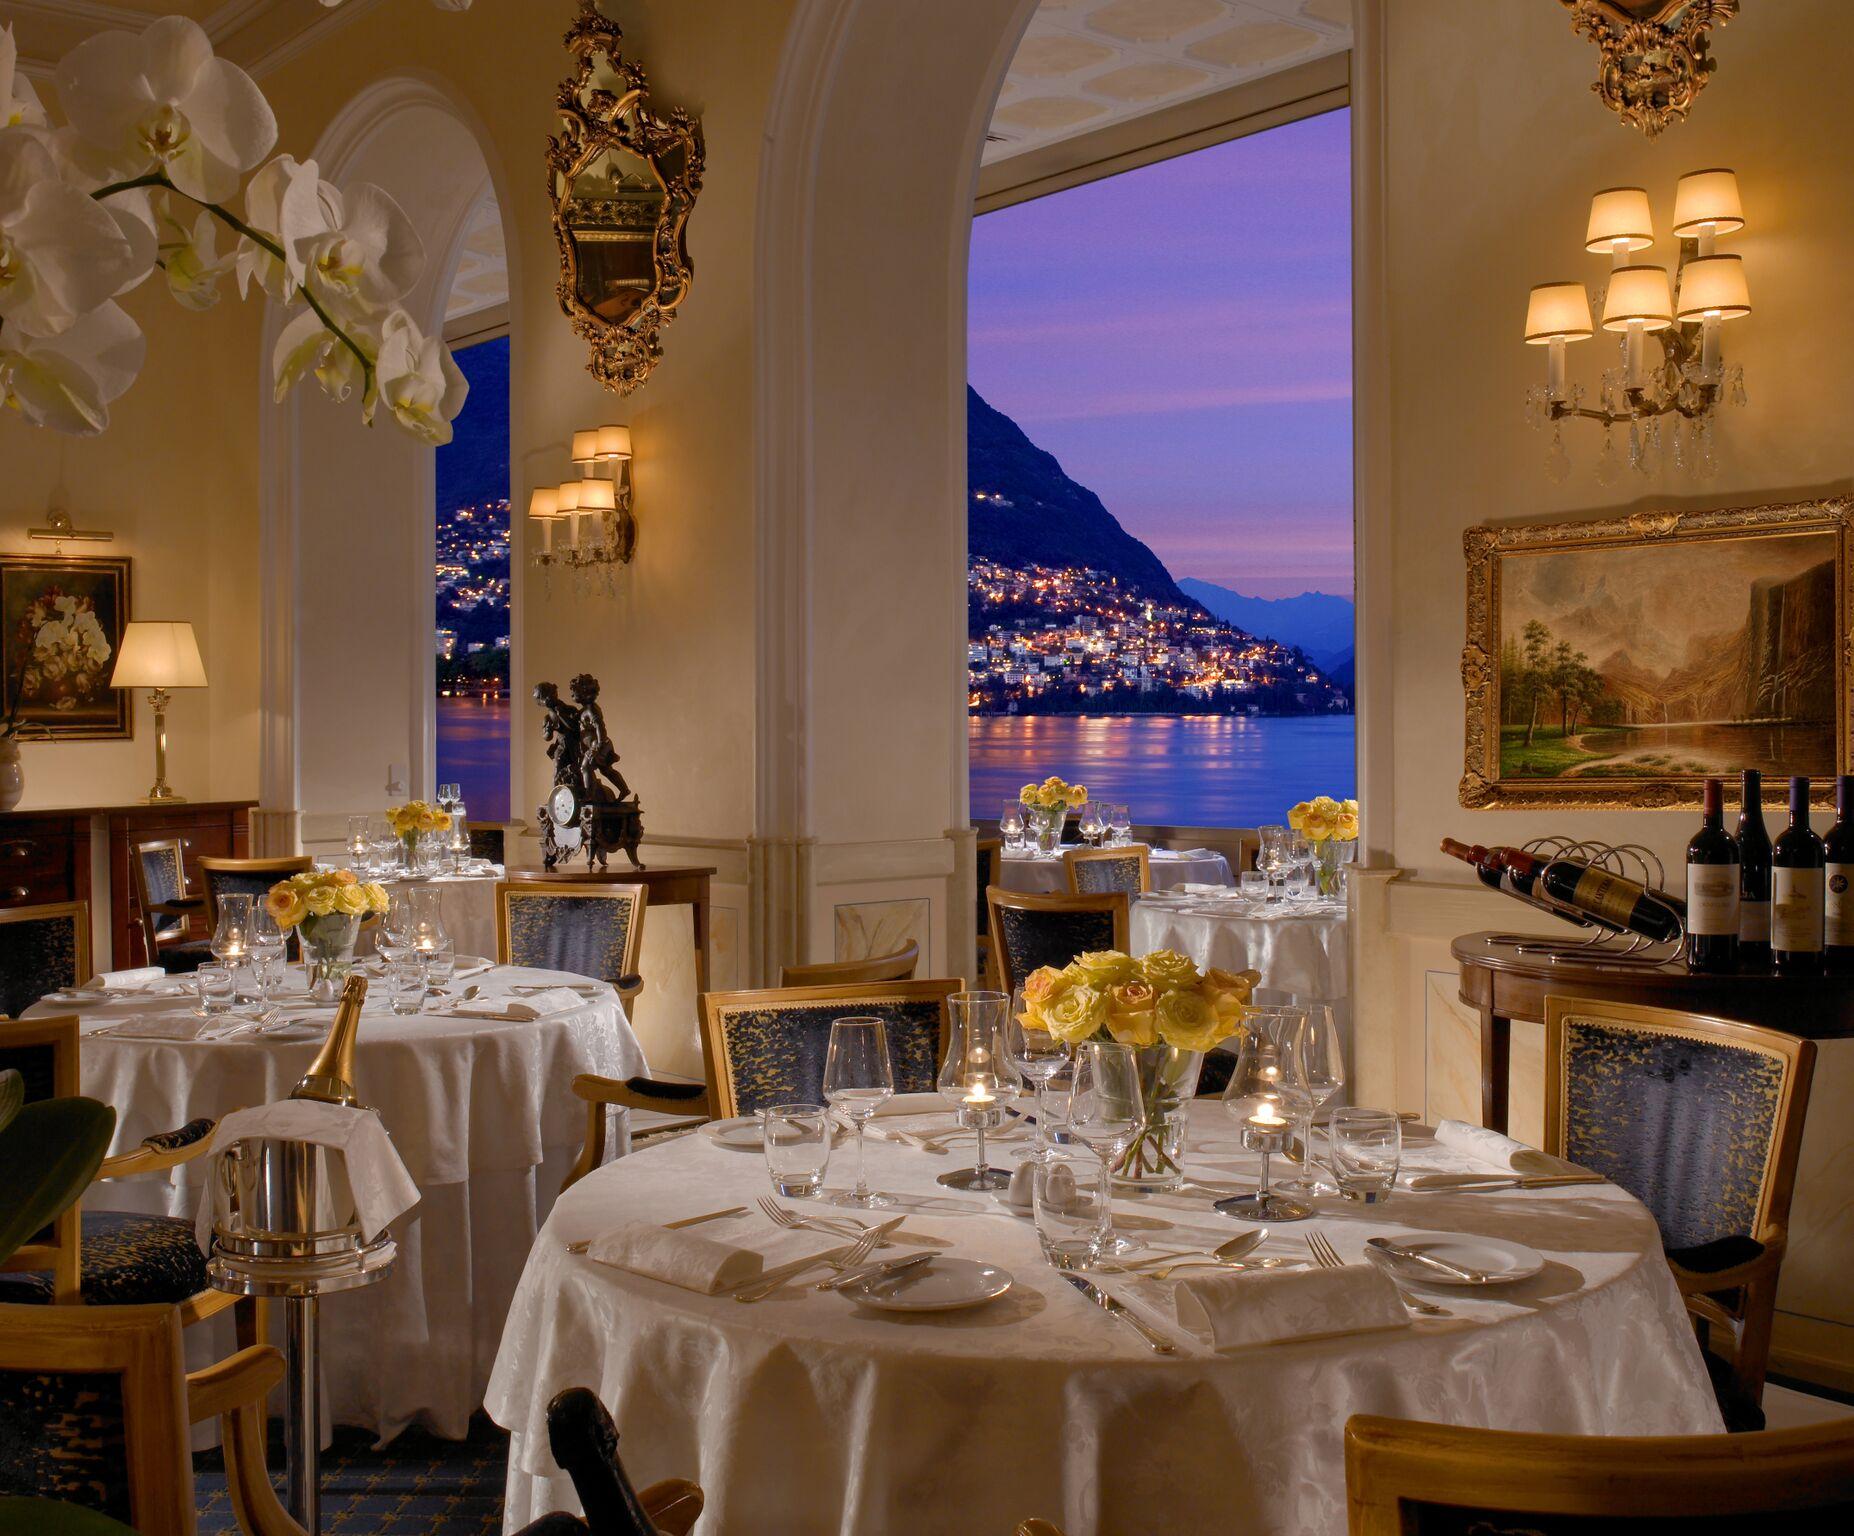 La Veranda Restaurant Hotel Splendide Royal Lugano